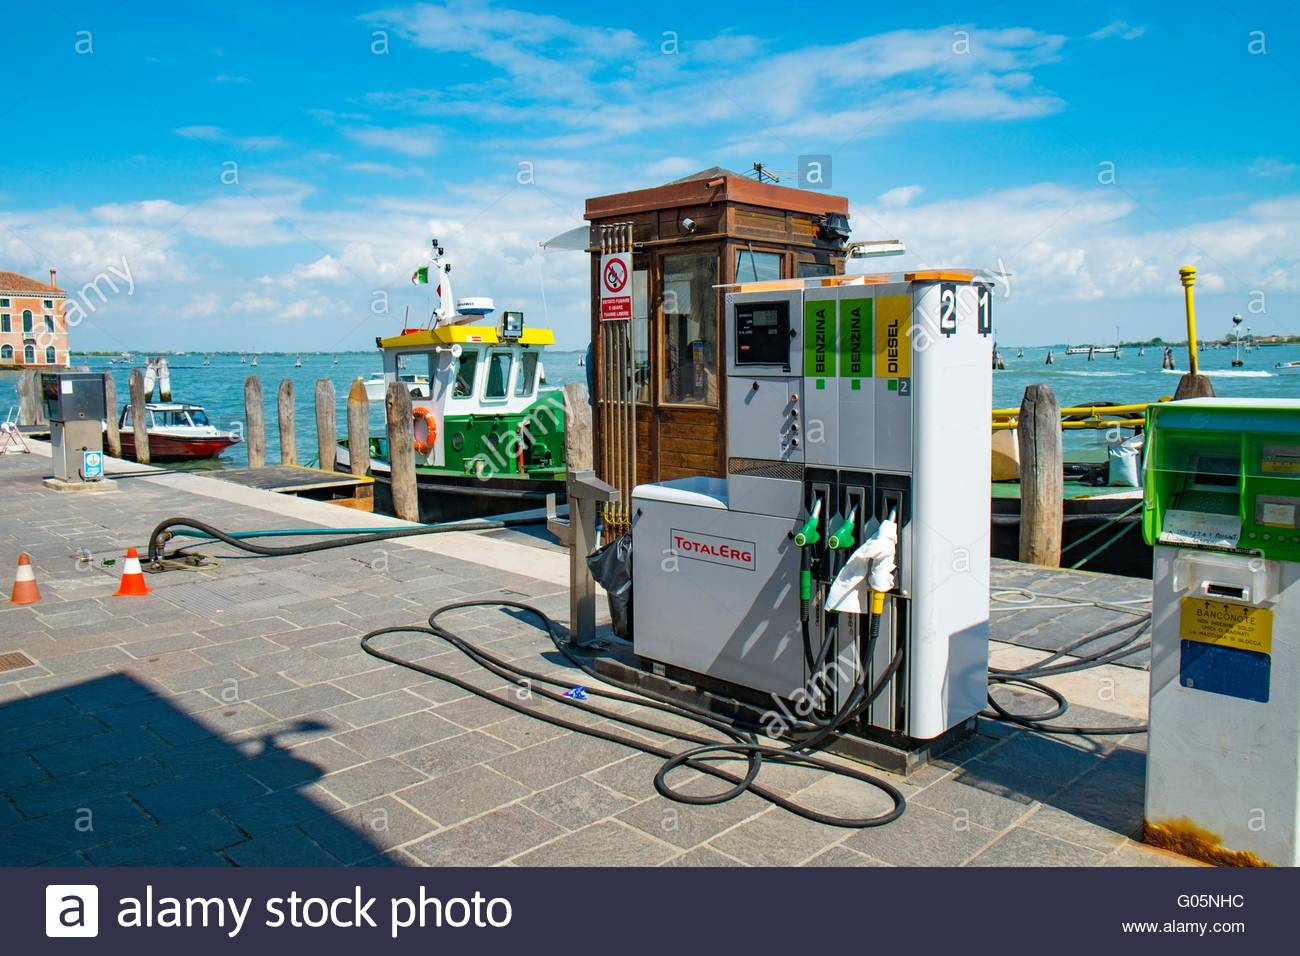 Waterside Bahnhof Kraftstoffpumpen, Venedig, Italien, April Stockbild